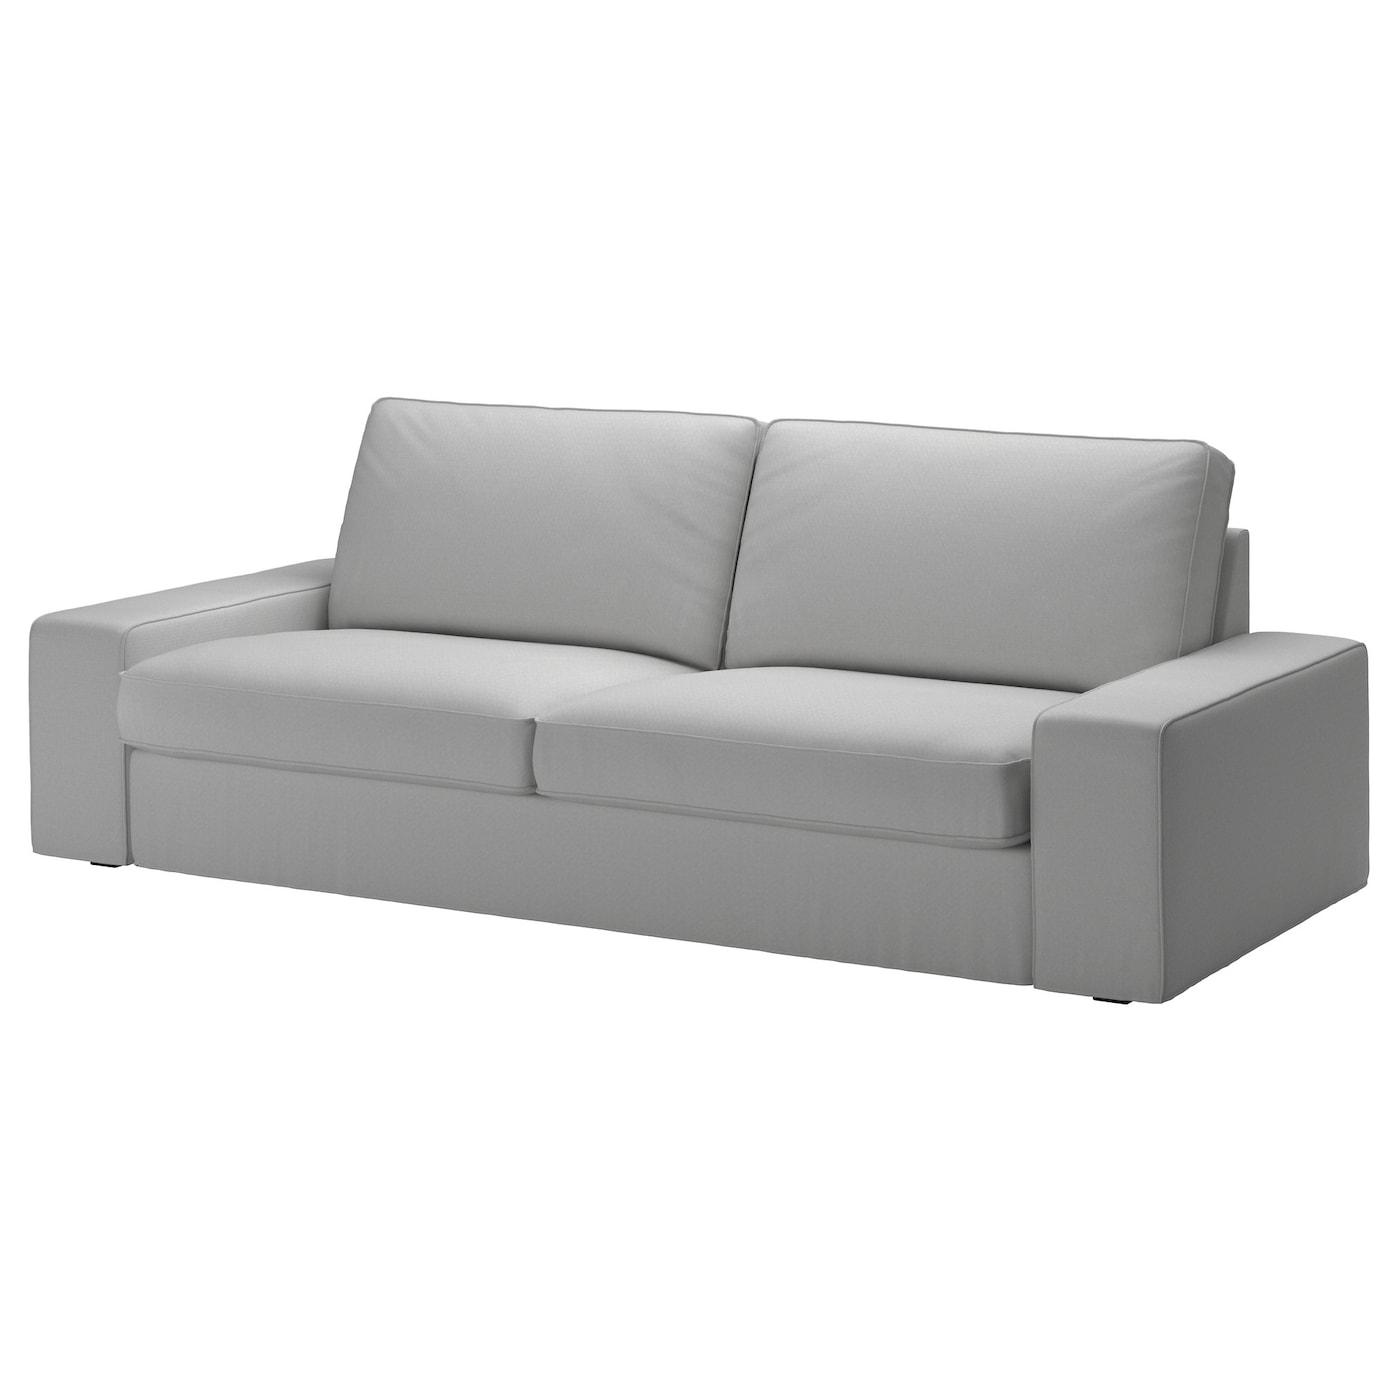 KIVIK Sofa, Orrsta Light Gray - IKEA